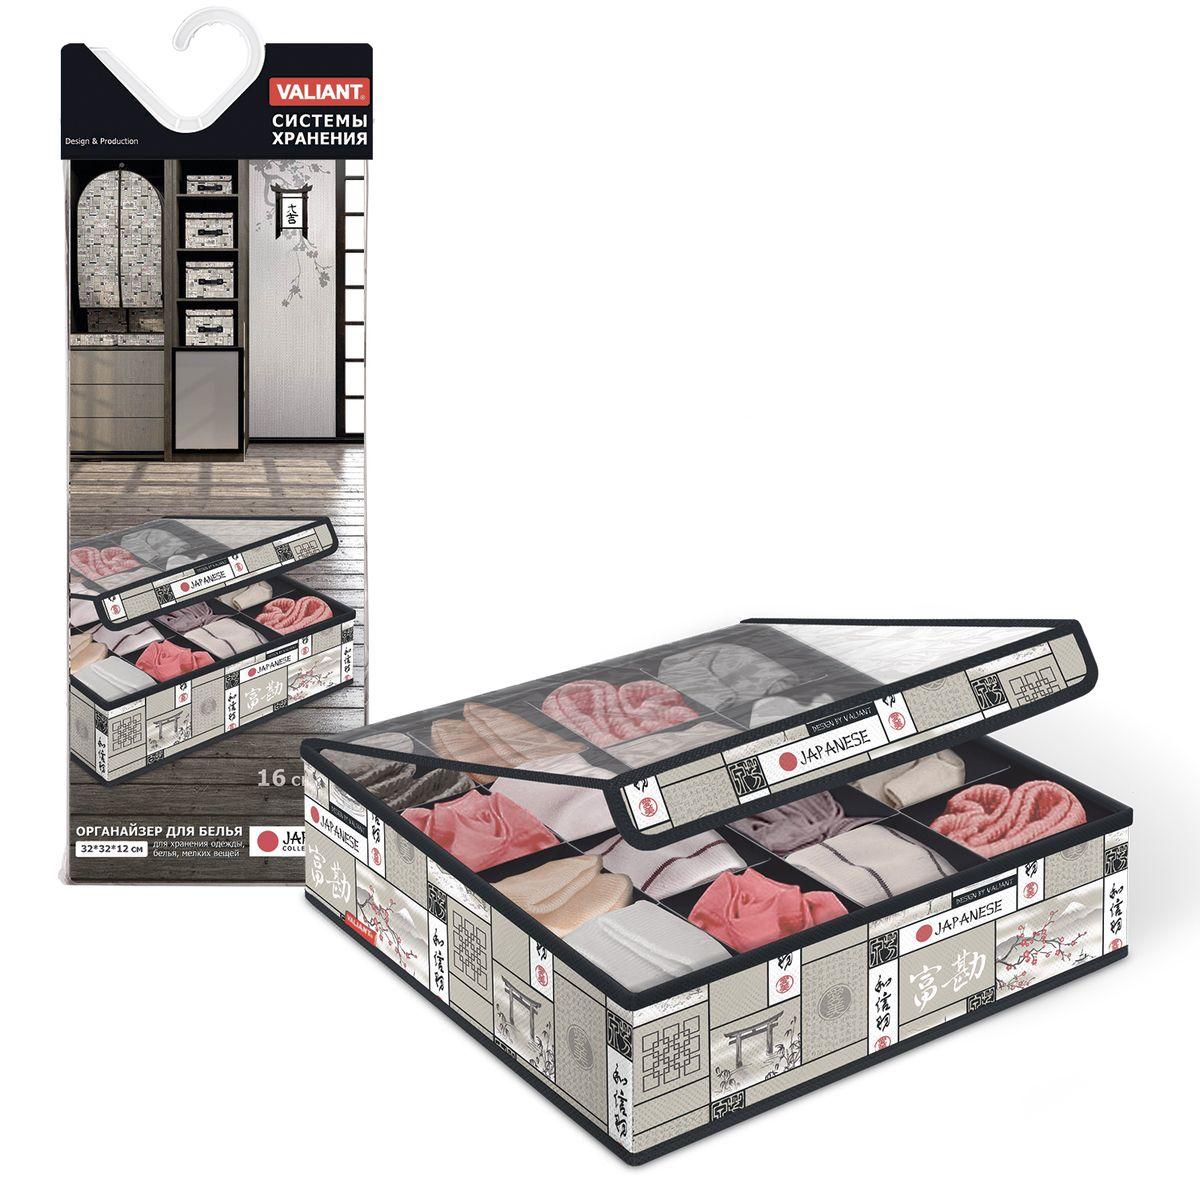 Органайзер для белья и носков Valiant Japanese White, с прозрачной крышкой, 16 секций, 32 х 32 х 12 см allen 2015 dw reloj mujer relojes nice